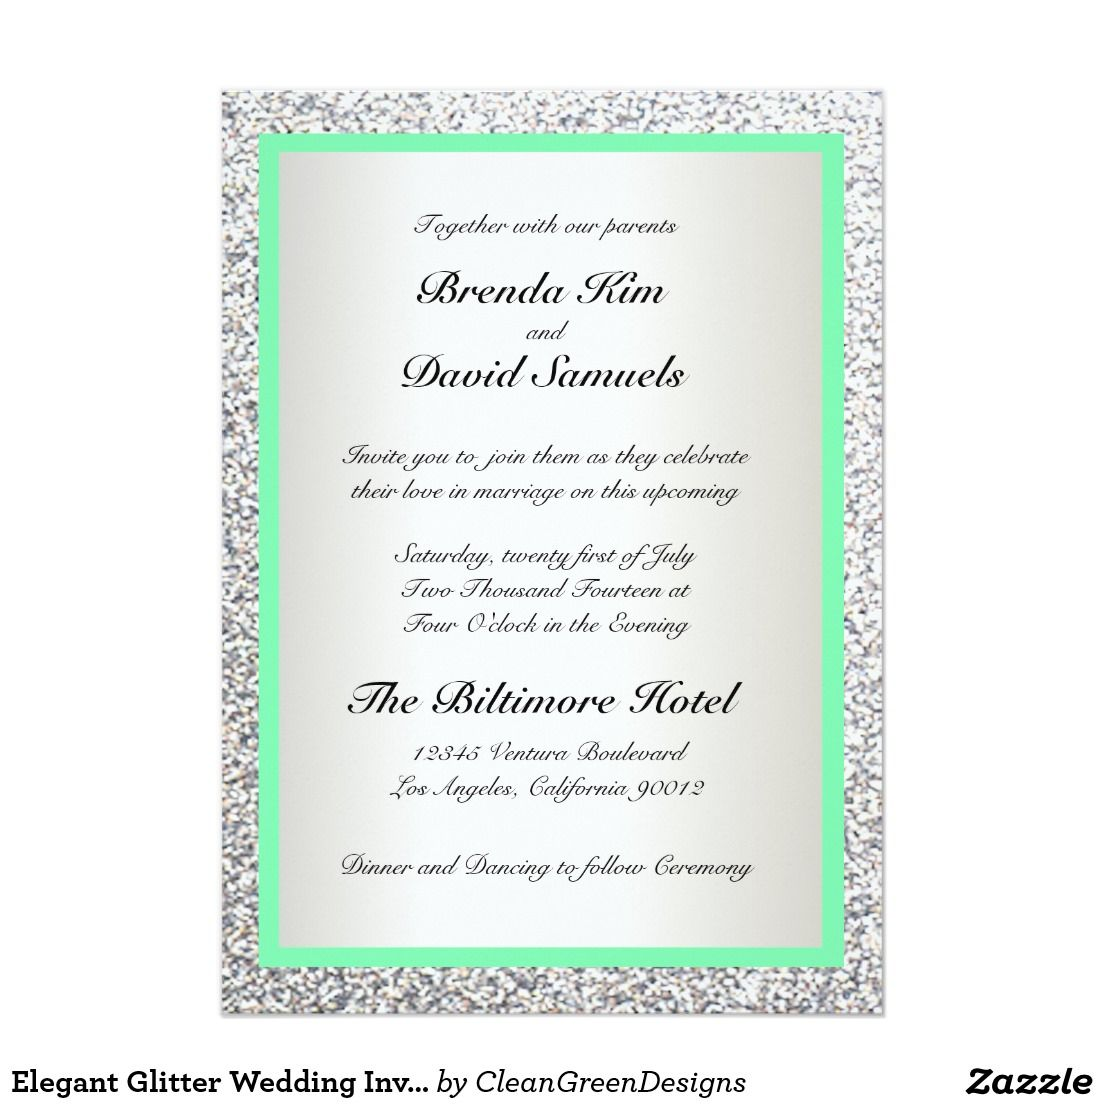 Elegant Glitter Wedding Invitation | Glitter wedding invitations ...